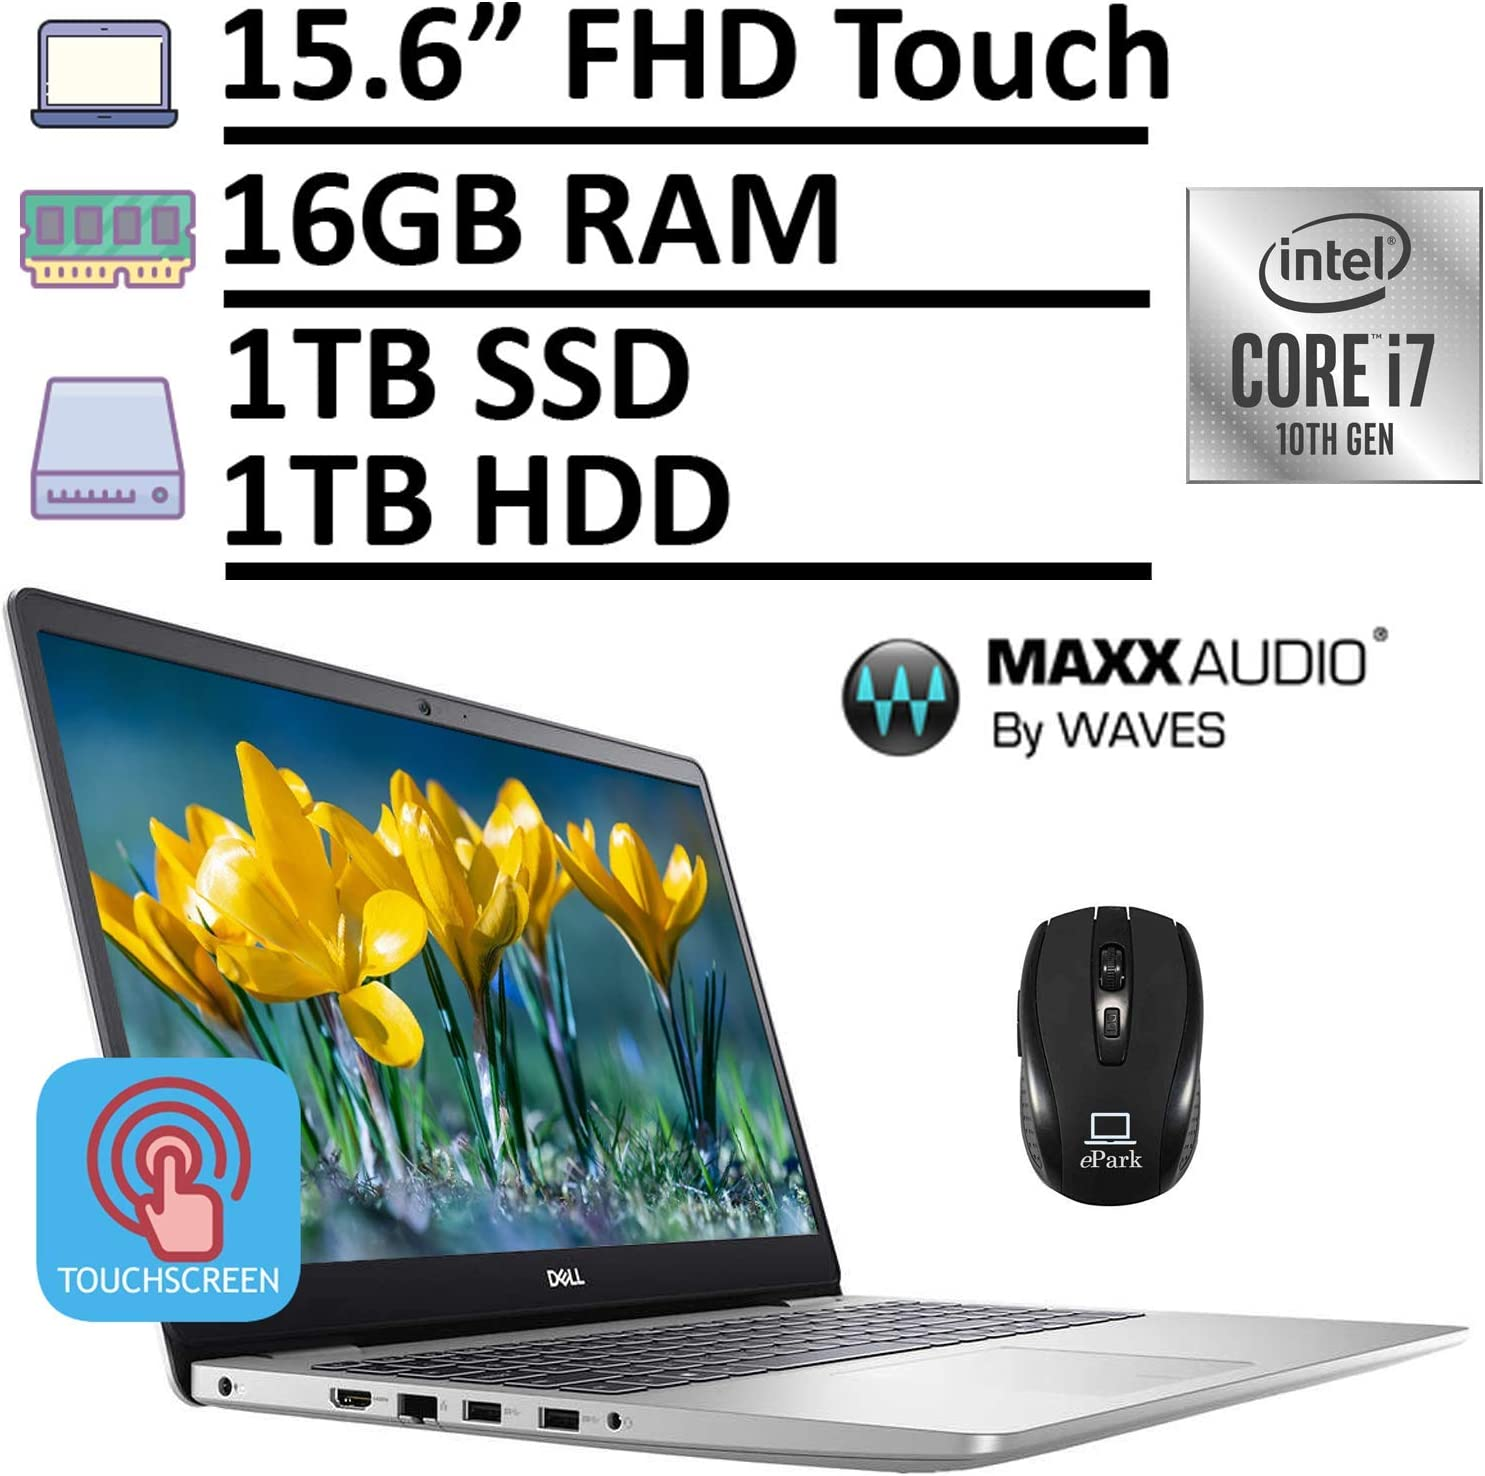 "2020 Latest Dell Inspiron 15 5000 5593 Laptop, 15.6"" FHD 1080p Touchscreen, 10th Gen Intel Core i7-10510U 16GB RAM 1TB SSD + 1TB HDD, MaxxAudio Pro Backlit KB Win 10 + ePark Wireless Mouse"